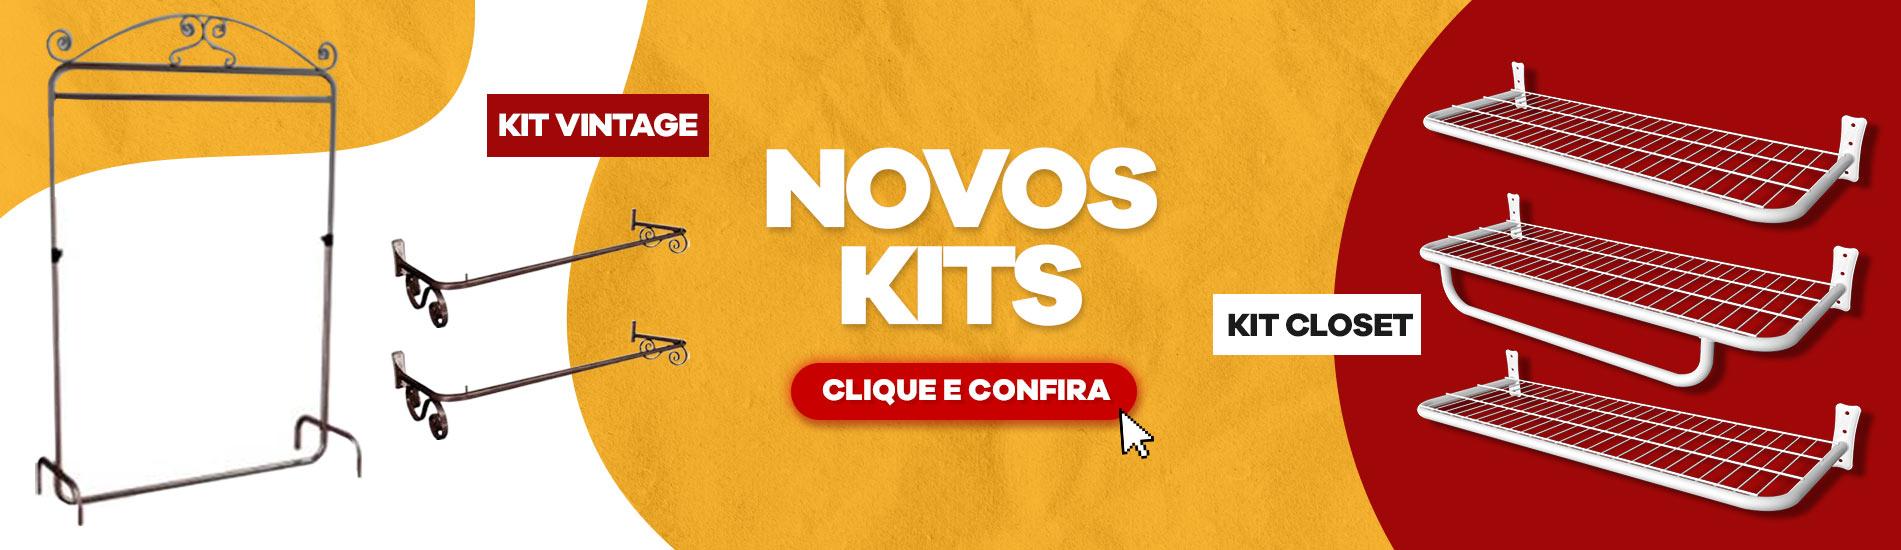 Banner Novos Kits